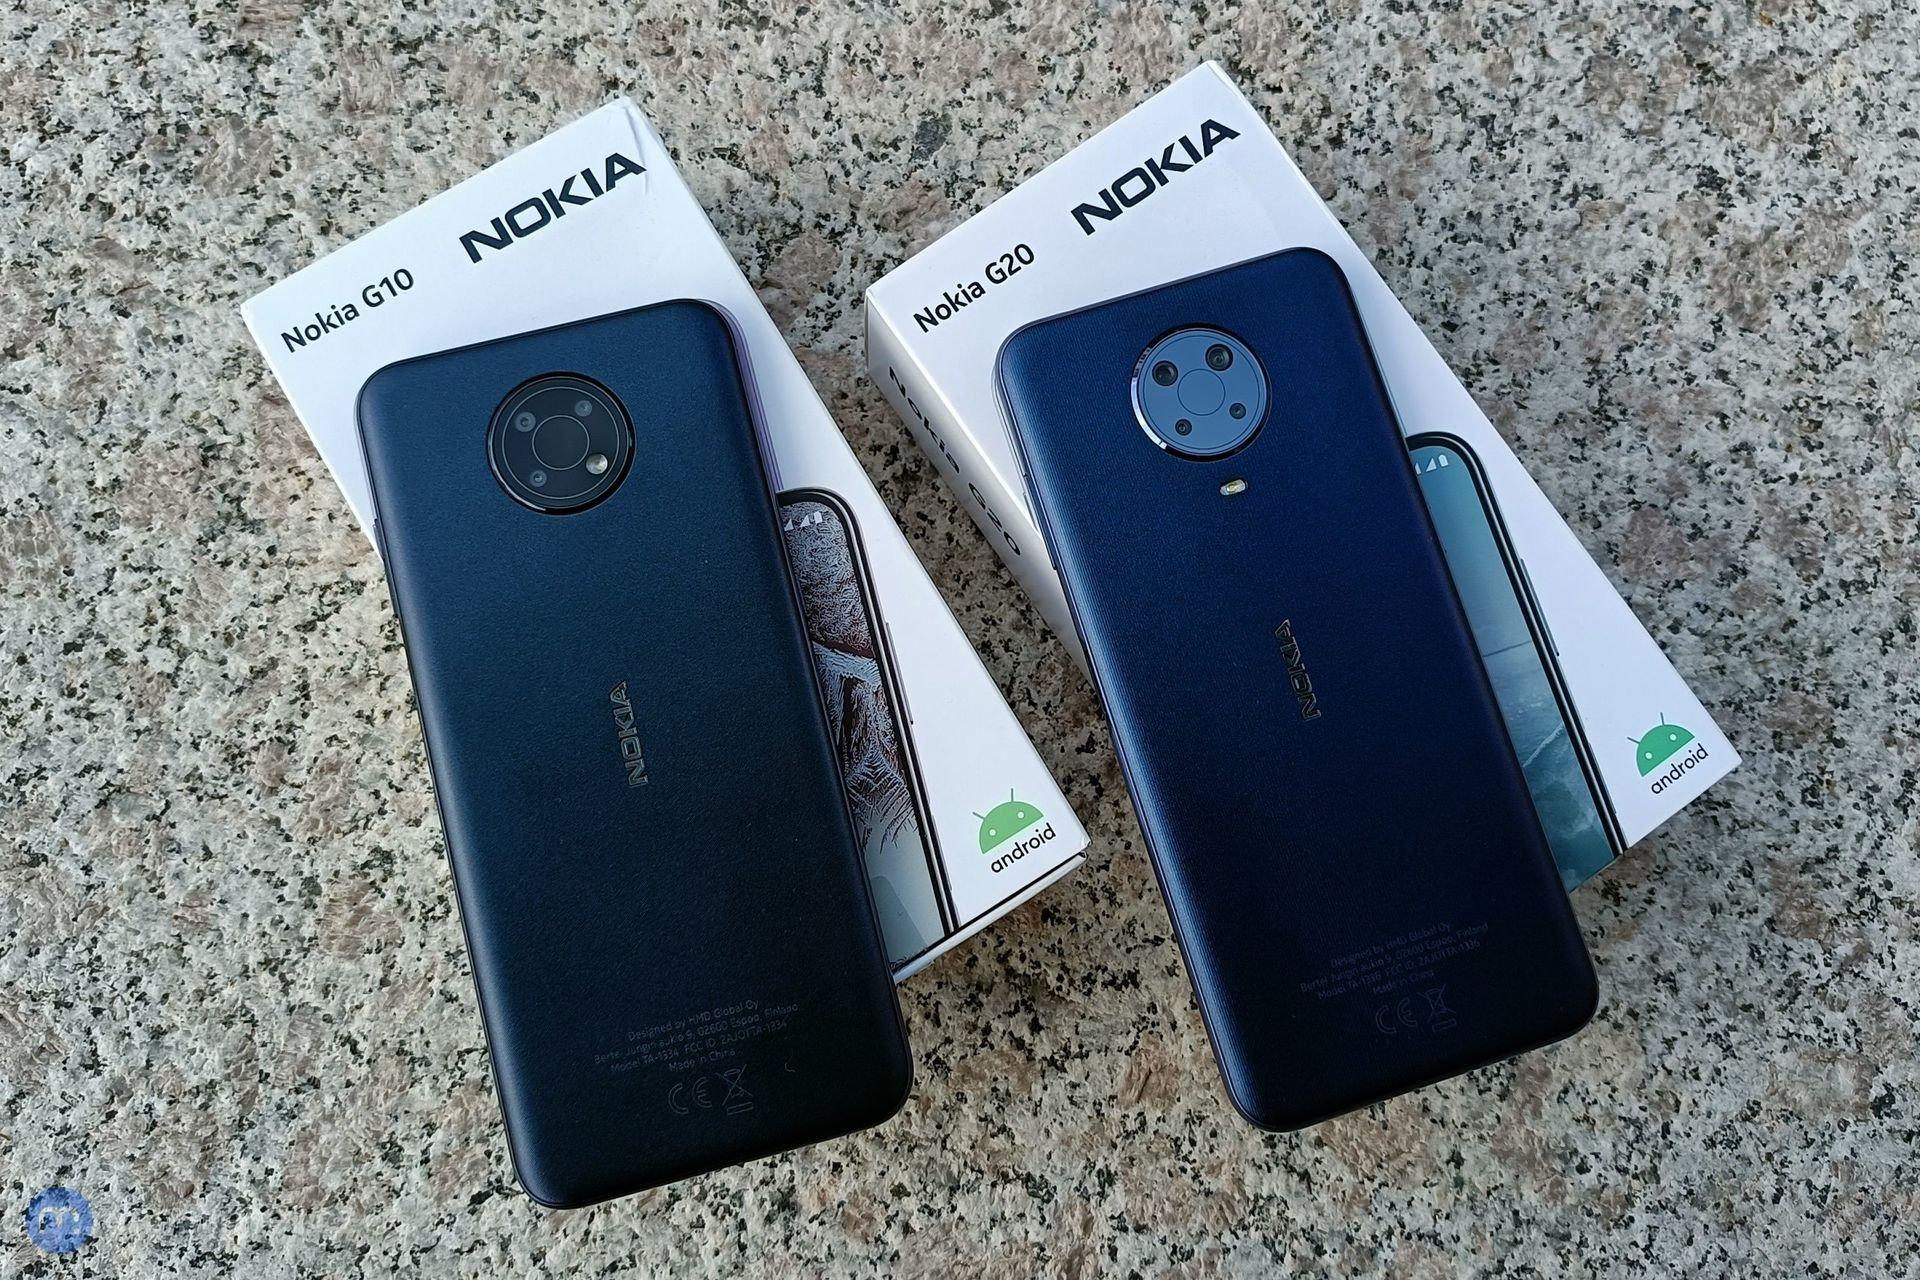 Nokia G10 a Nokia G20